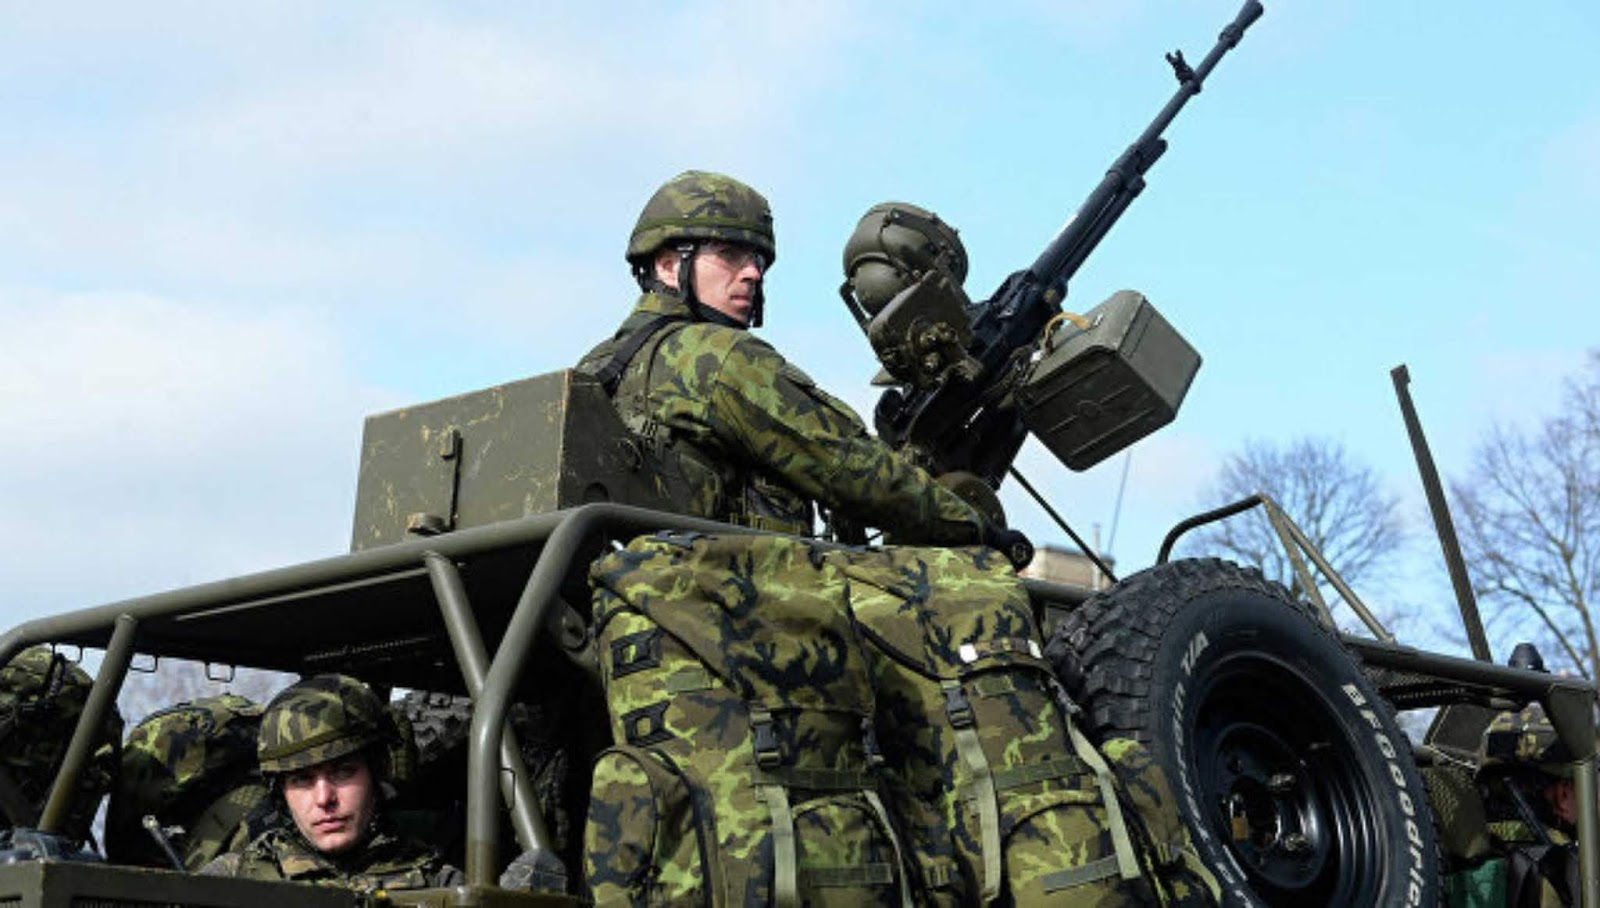 Angkatan Bersenjata Republik Ceko malu untuk menunjukkan peralatan lama mereka